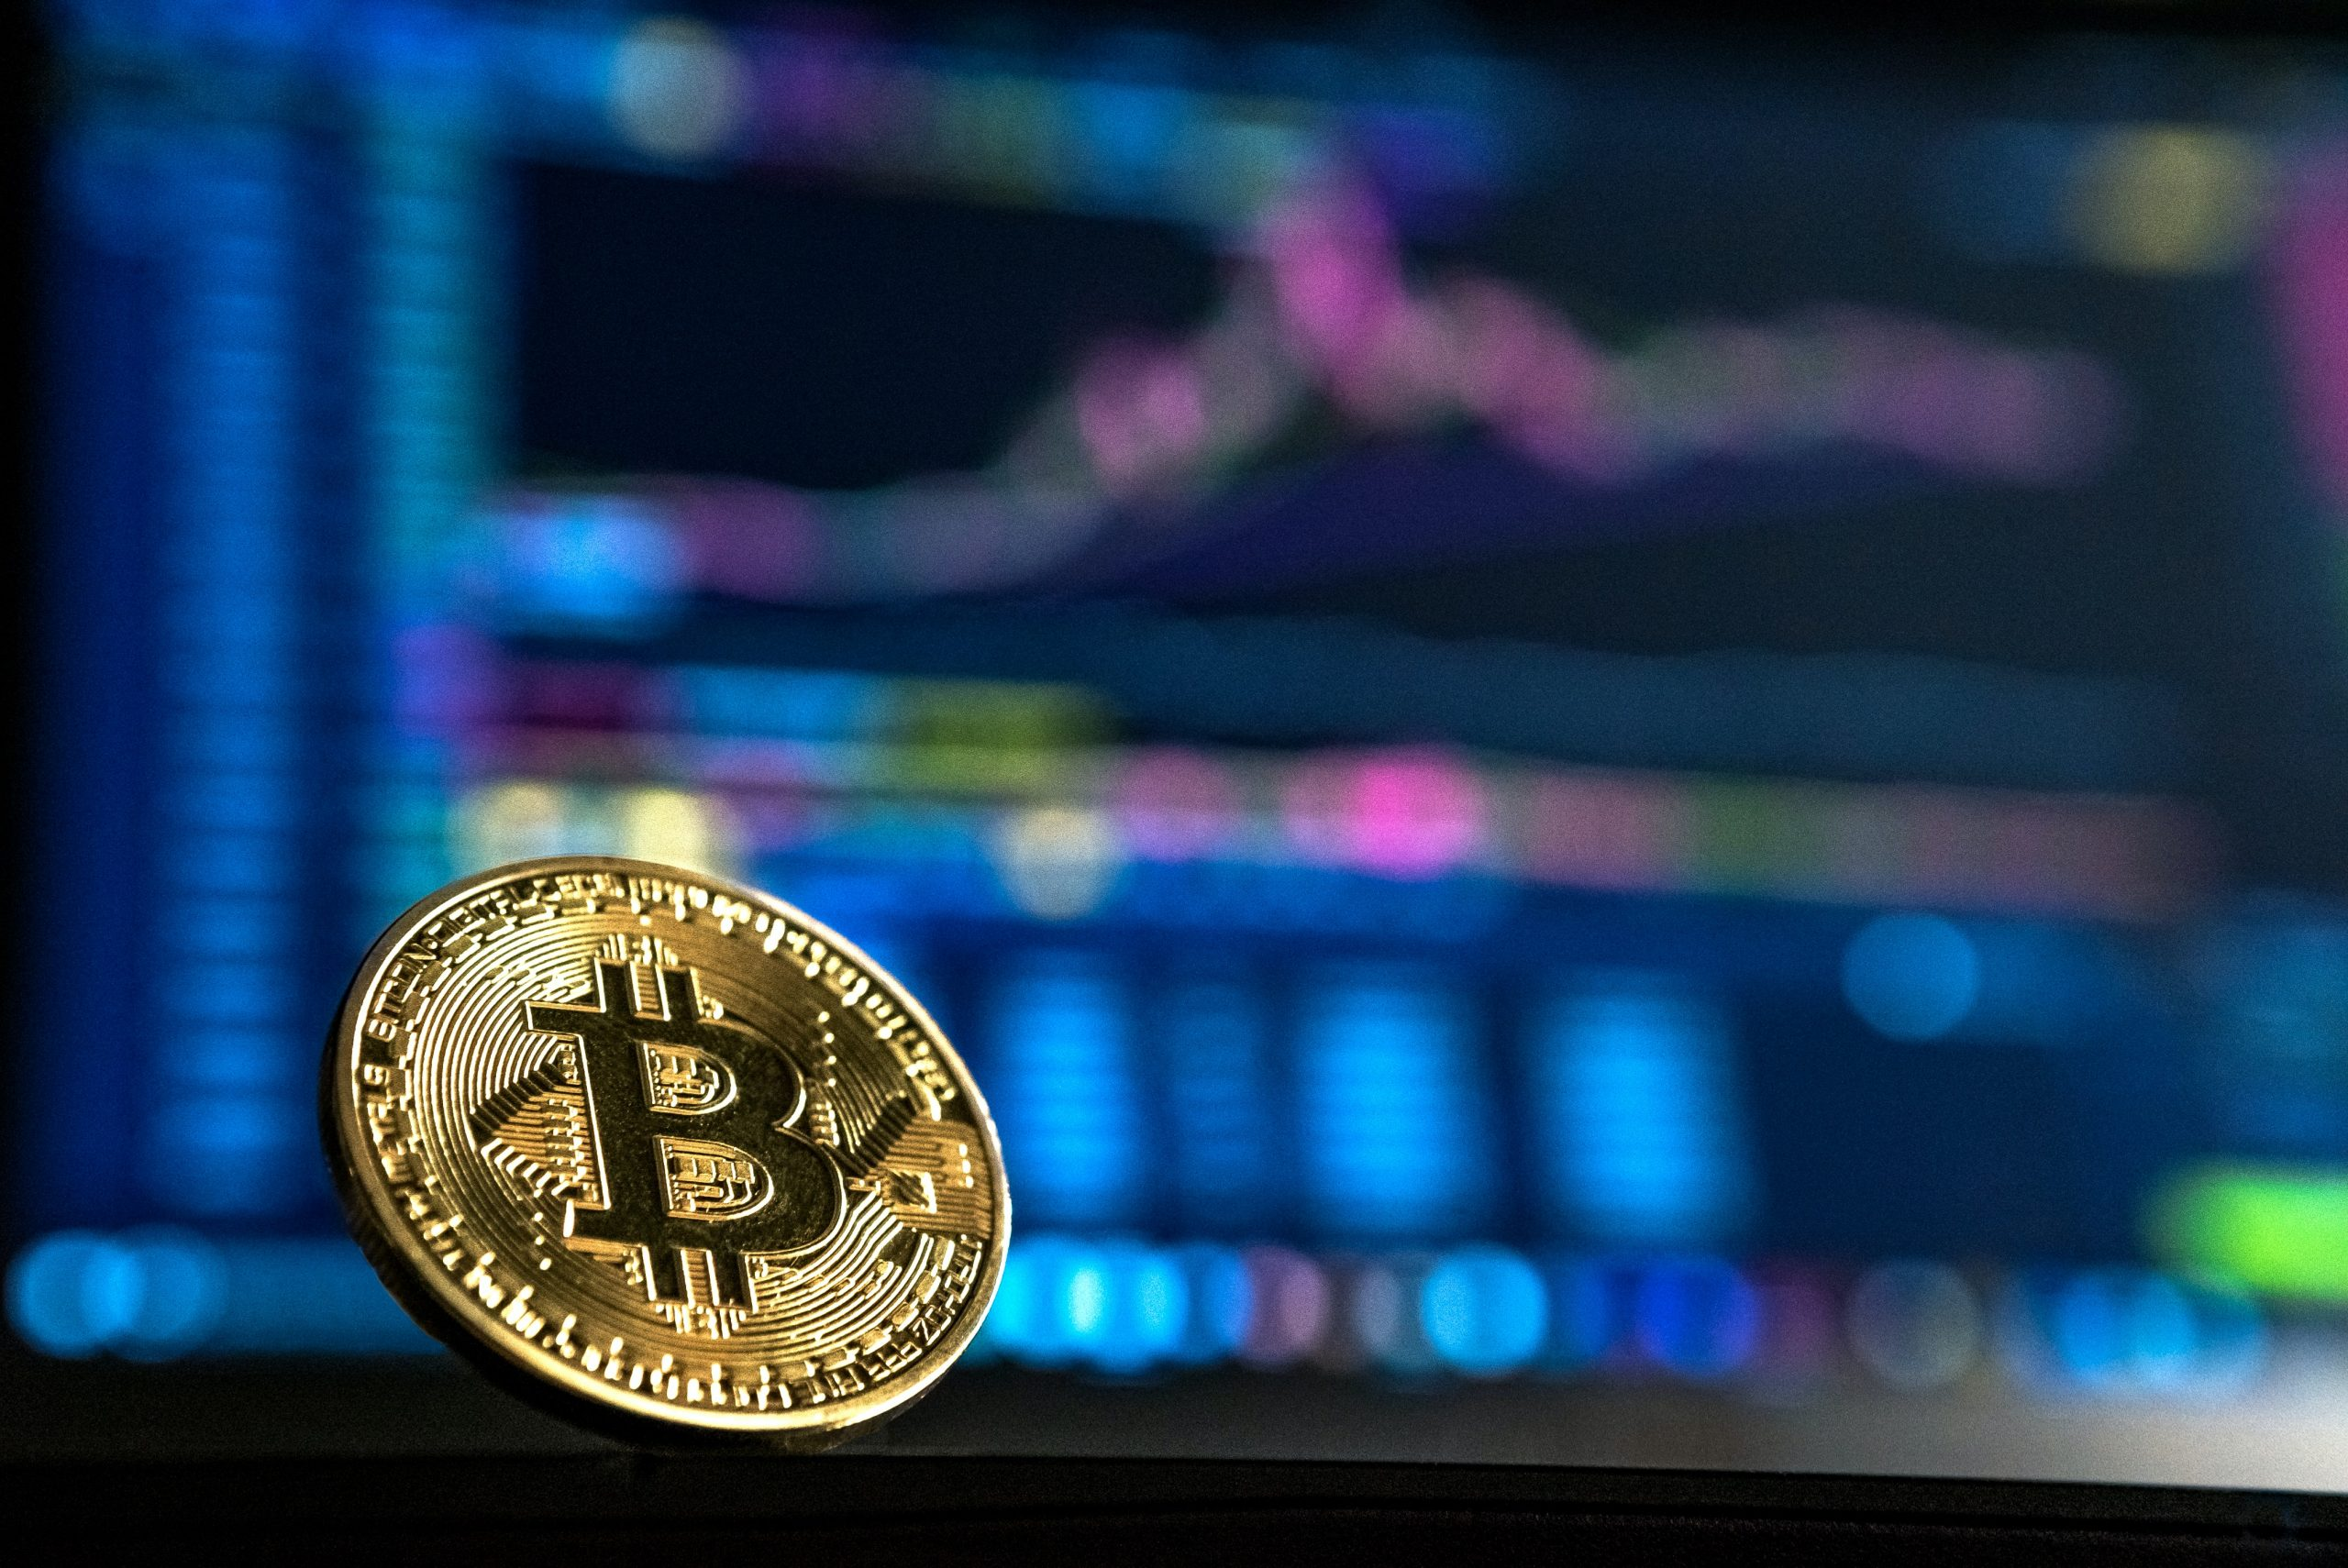 5 redenen om nú te investeren in crypto